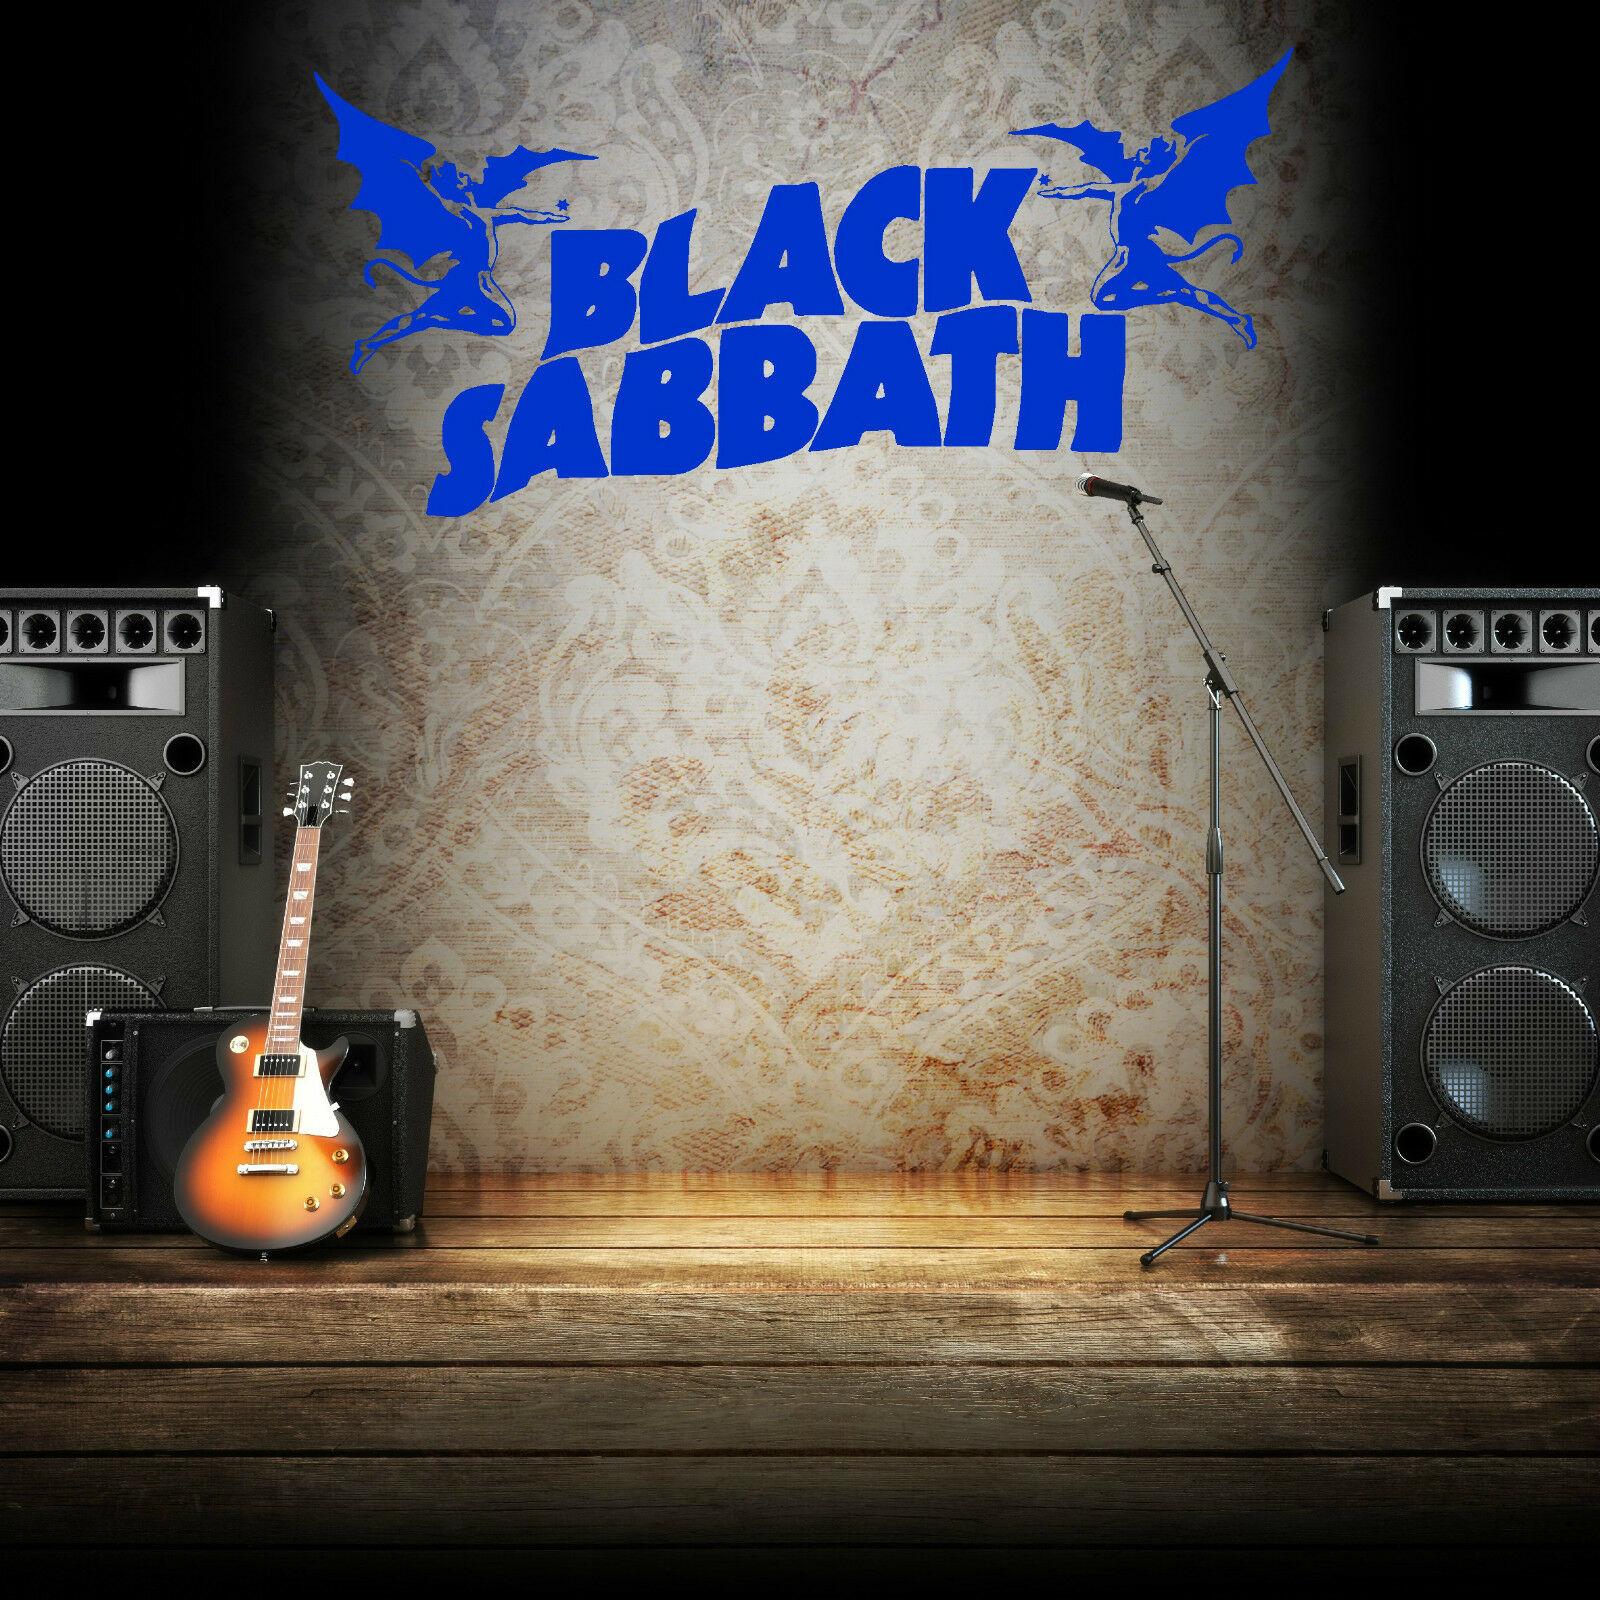 Details About Black Sabbath Ozzy Osbourne Vinyl Wall Art Sticker Decal Within Osbourne Wall Decor (Photo 19 of 30)